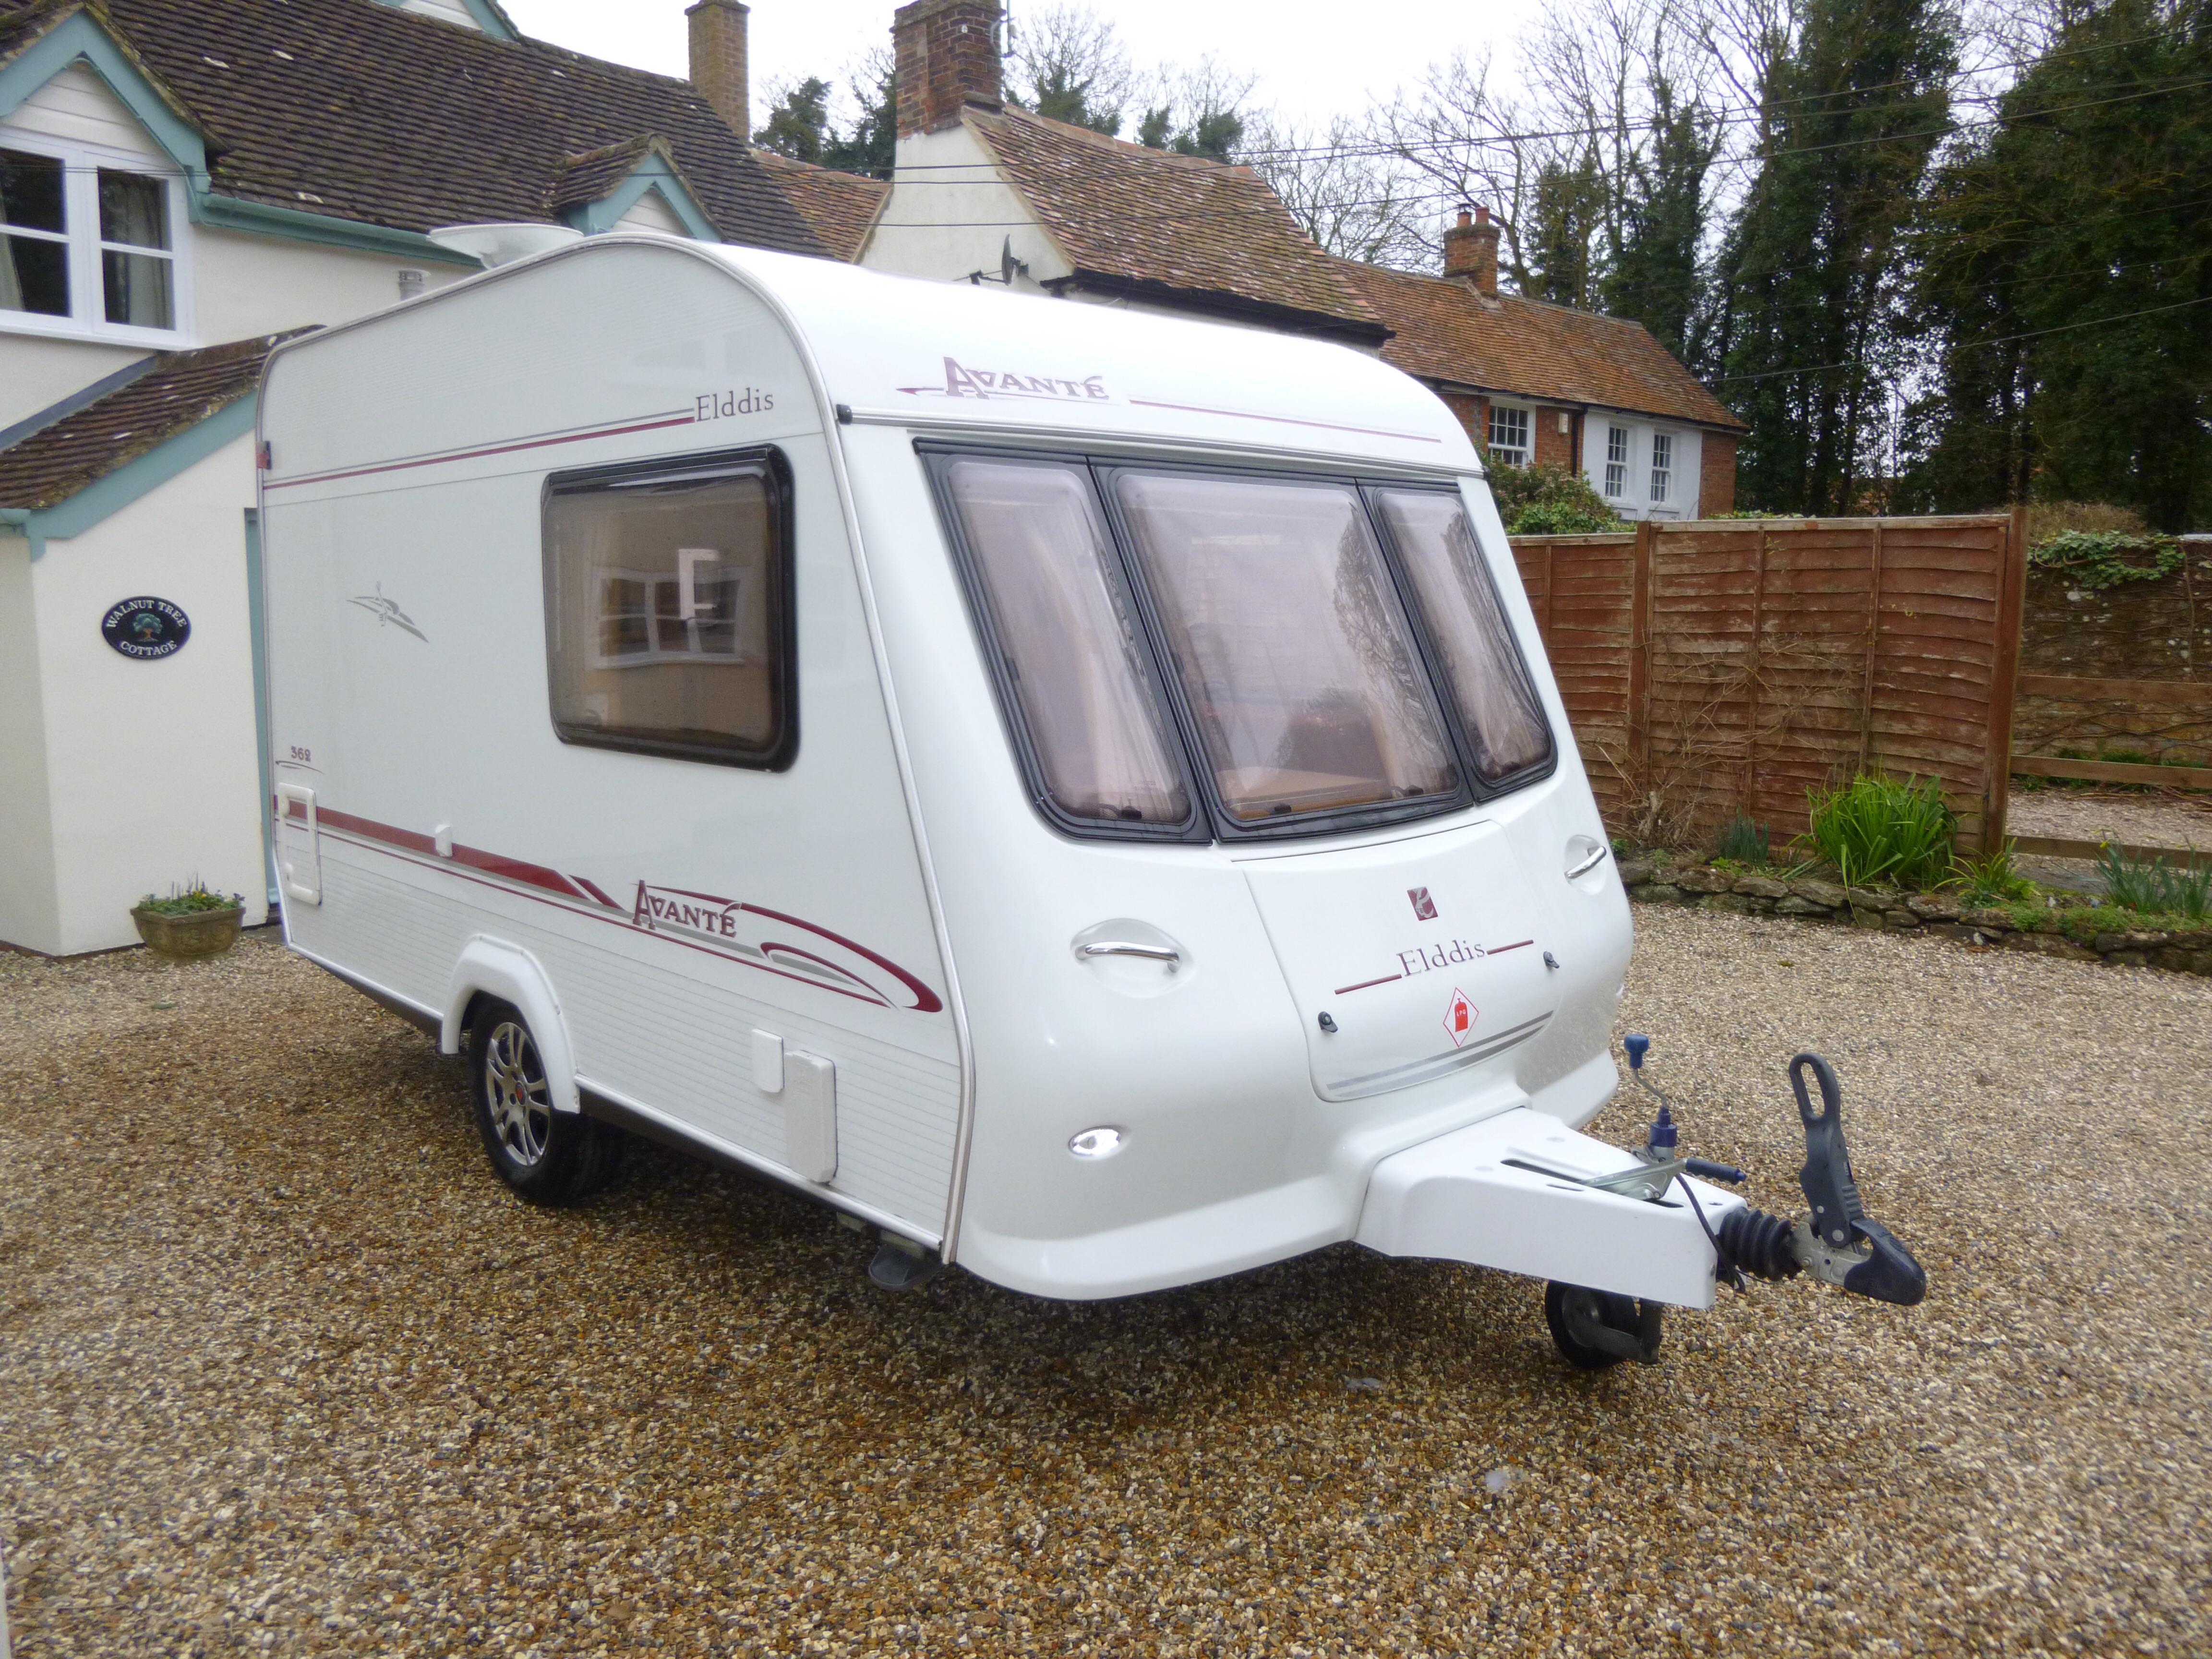 Sold 2004 Elddis Avante 362 2 Berth Caravan 15995 00